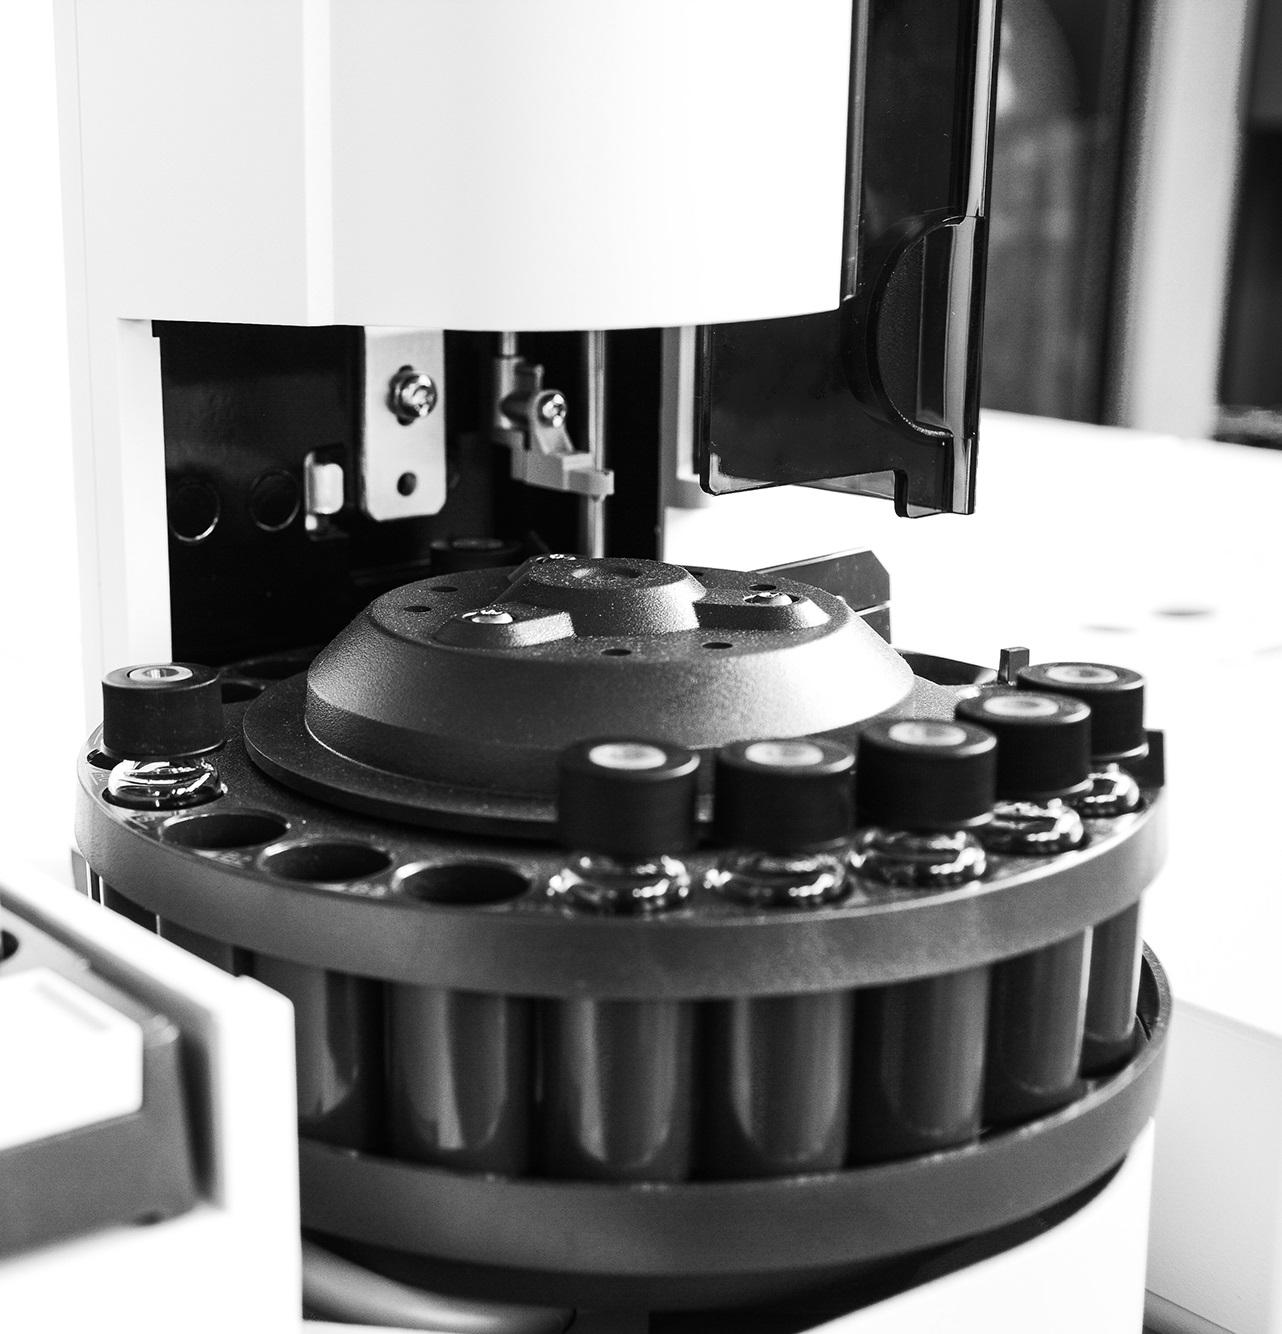 Chemnovatic laboratory test and analysis of e-liquids